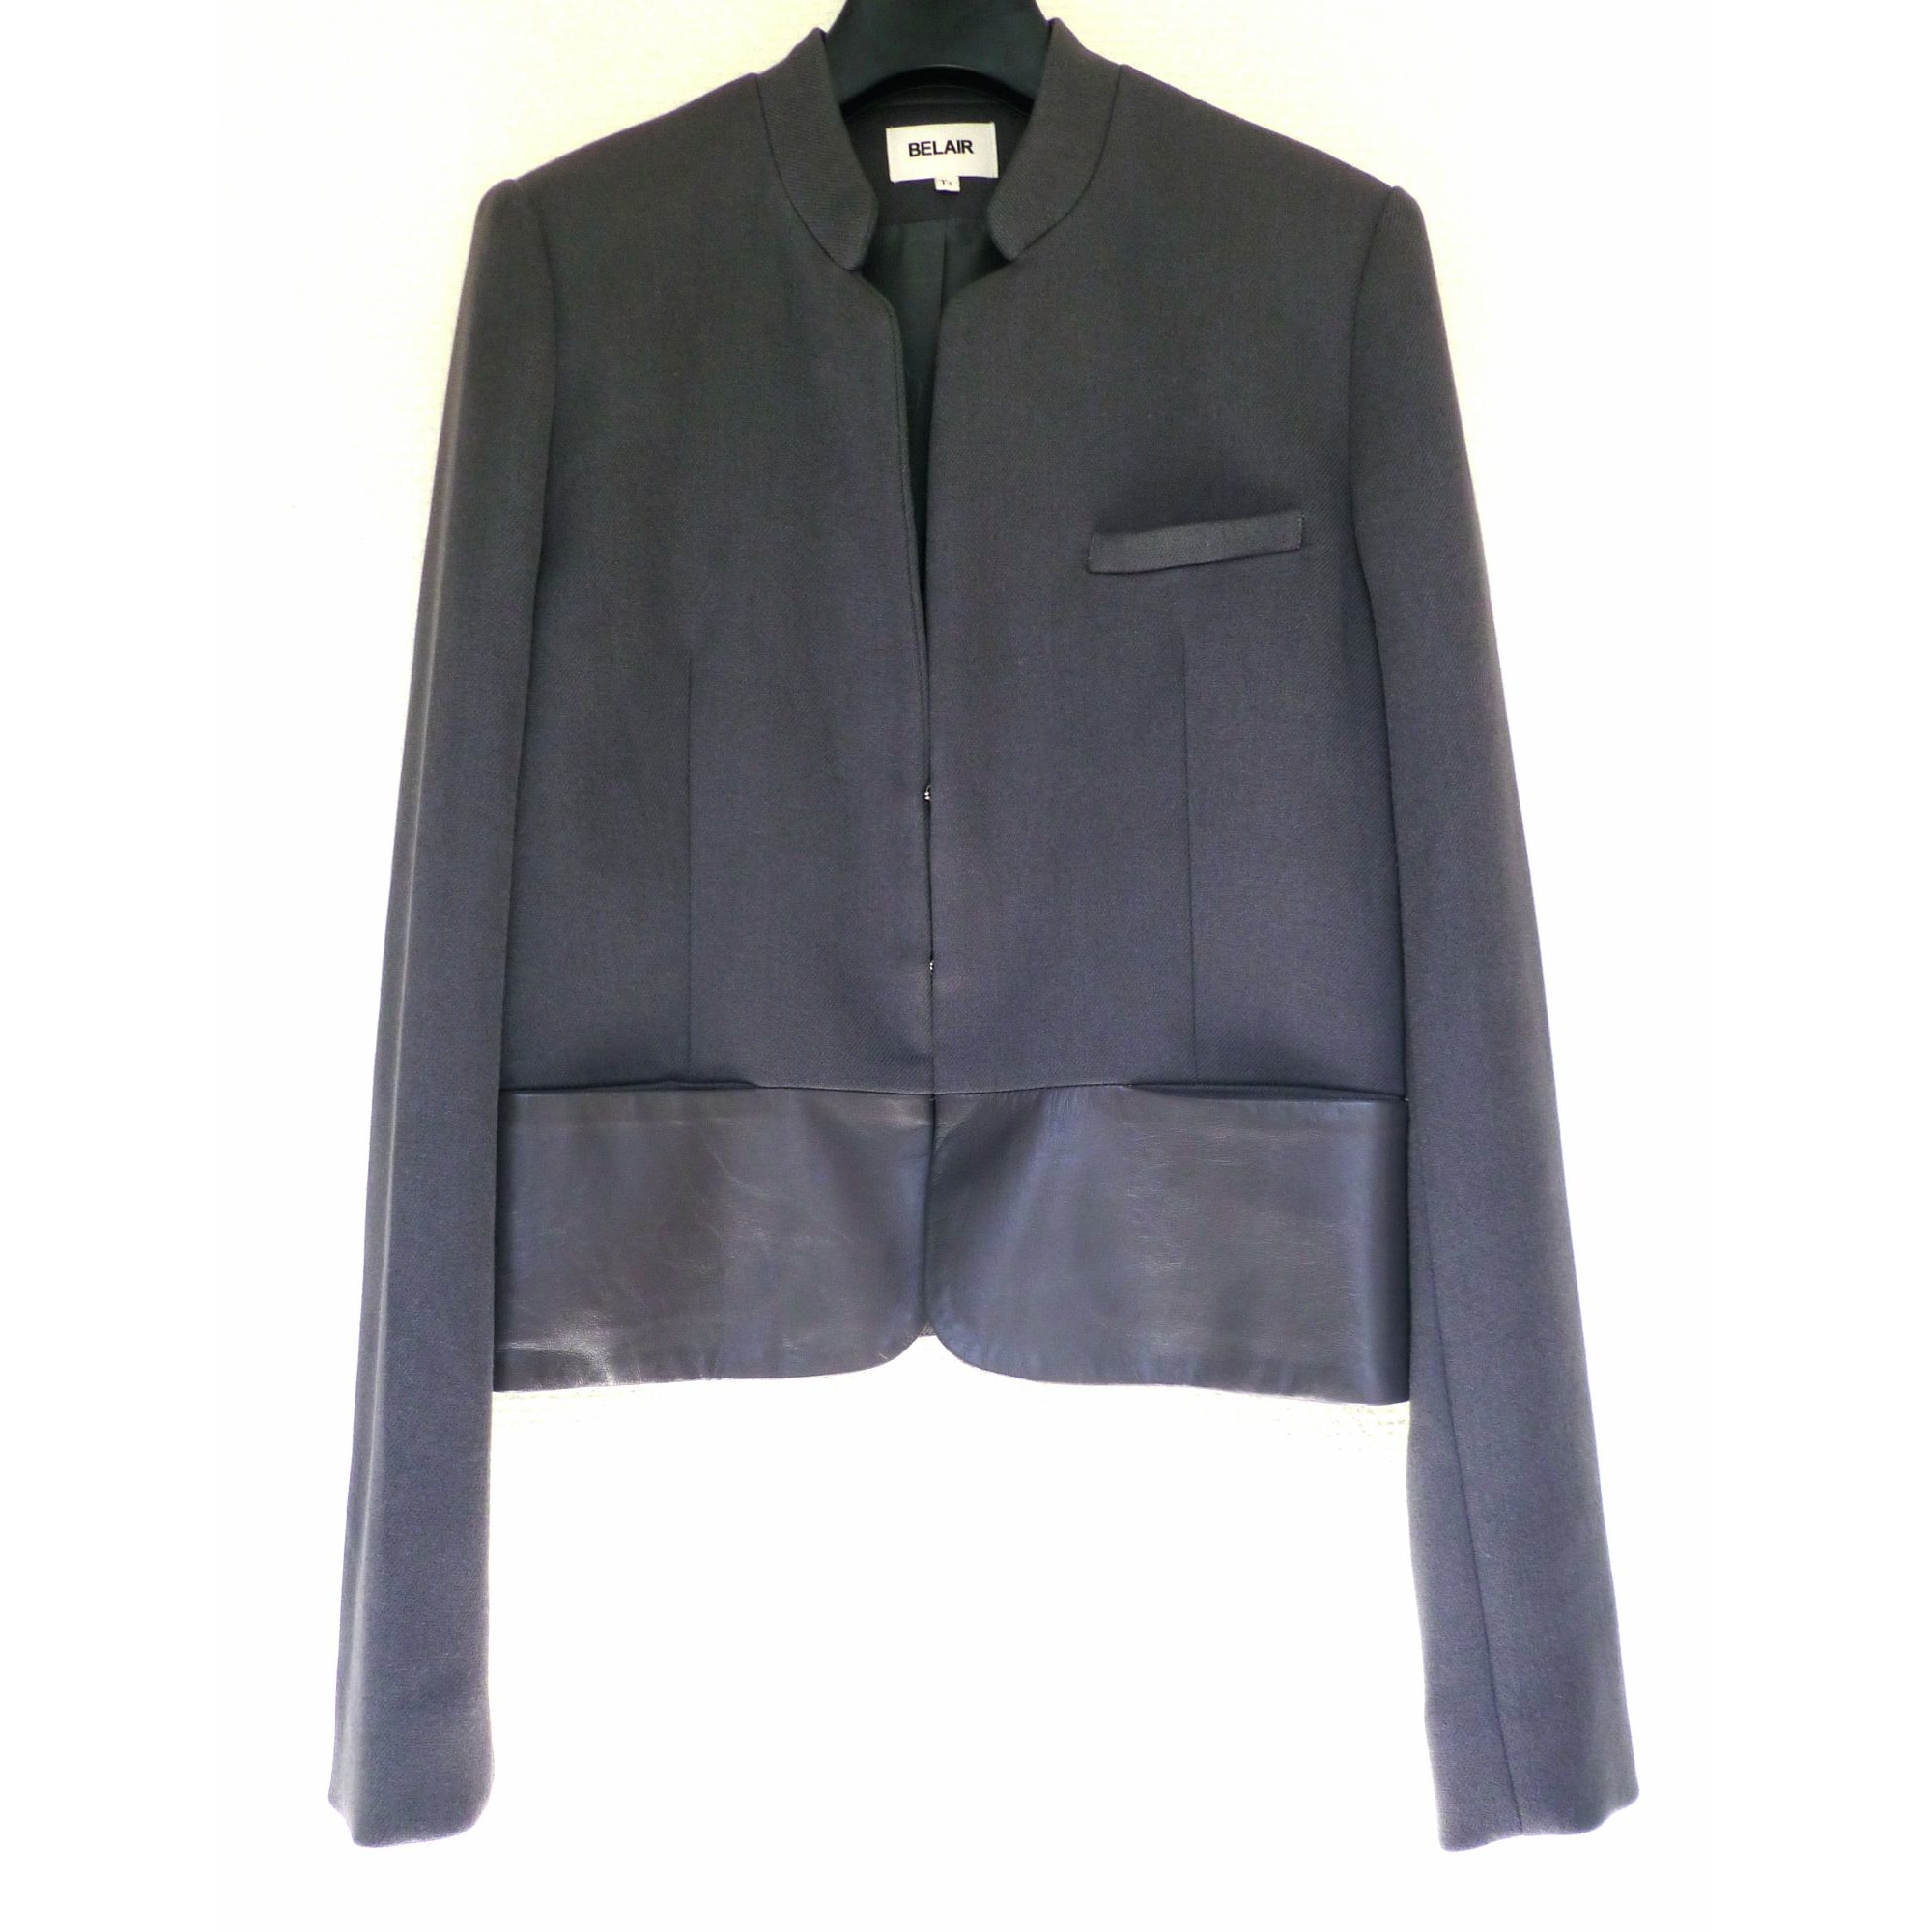 Blazer, veste tailleur BEL AIR Gris, anthracite